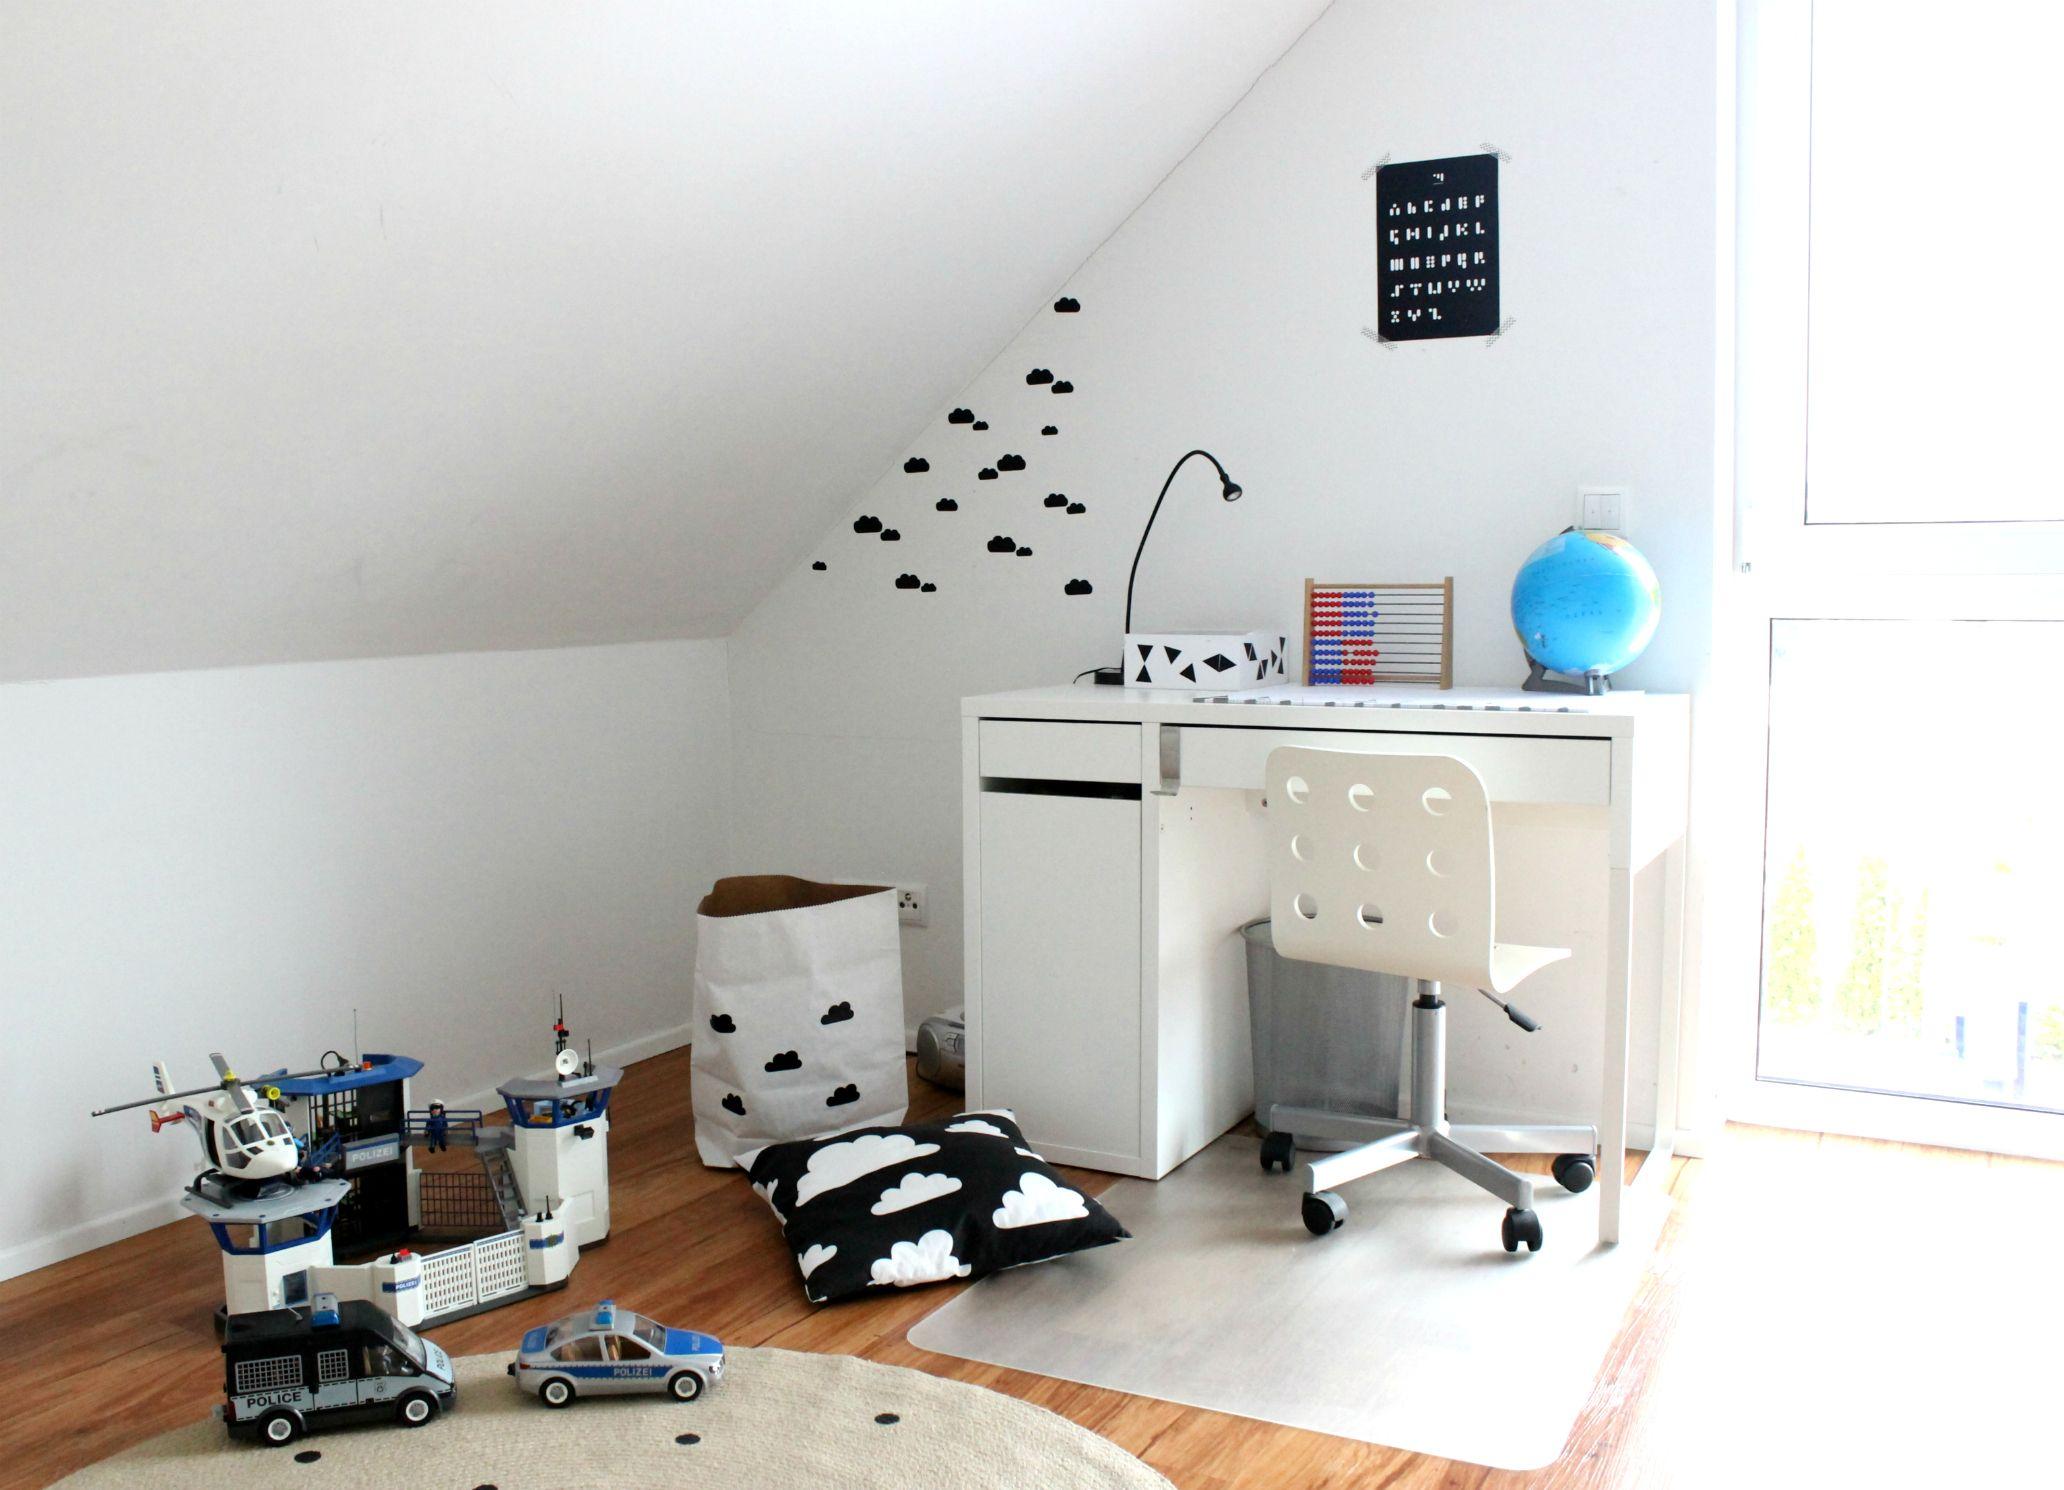 Kinderzimmer, Ikea, Kinderzimmerinspiration Schulkind, Jungszimmer ... | {Kinderzimmer de 14}